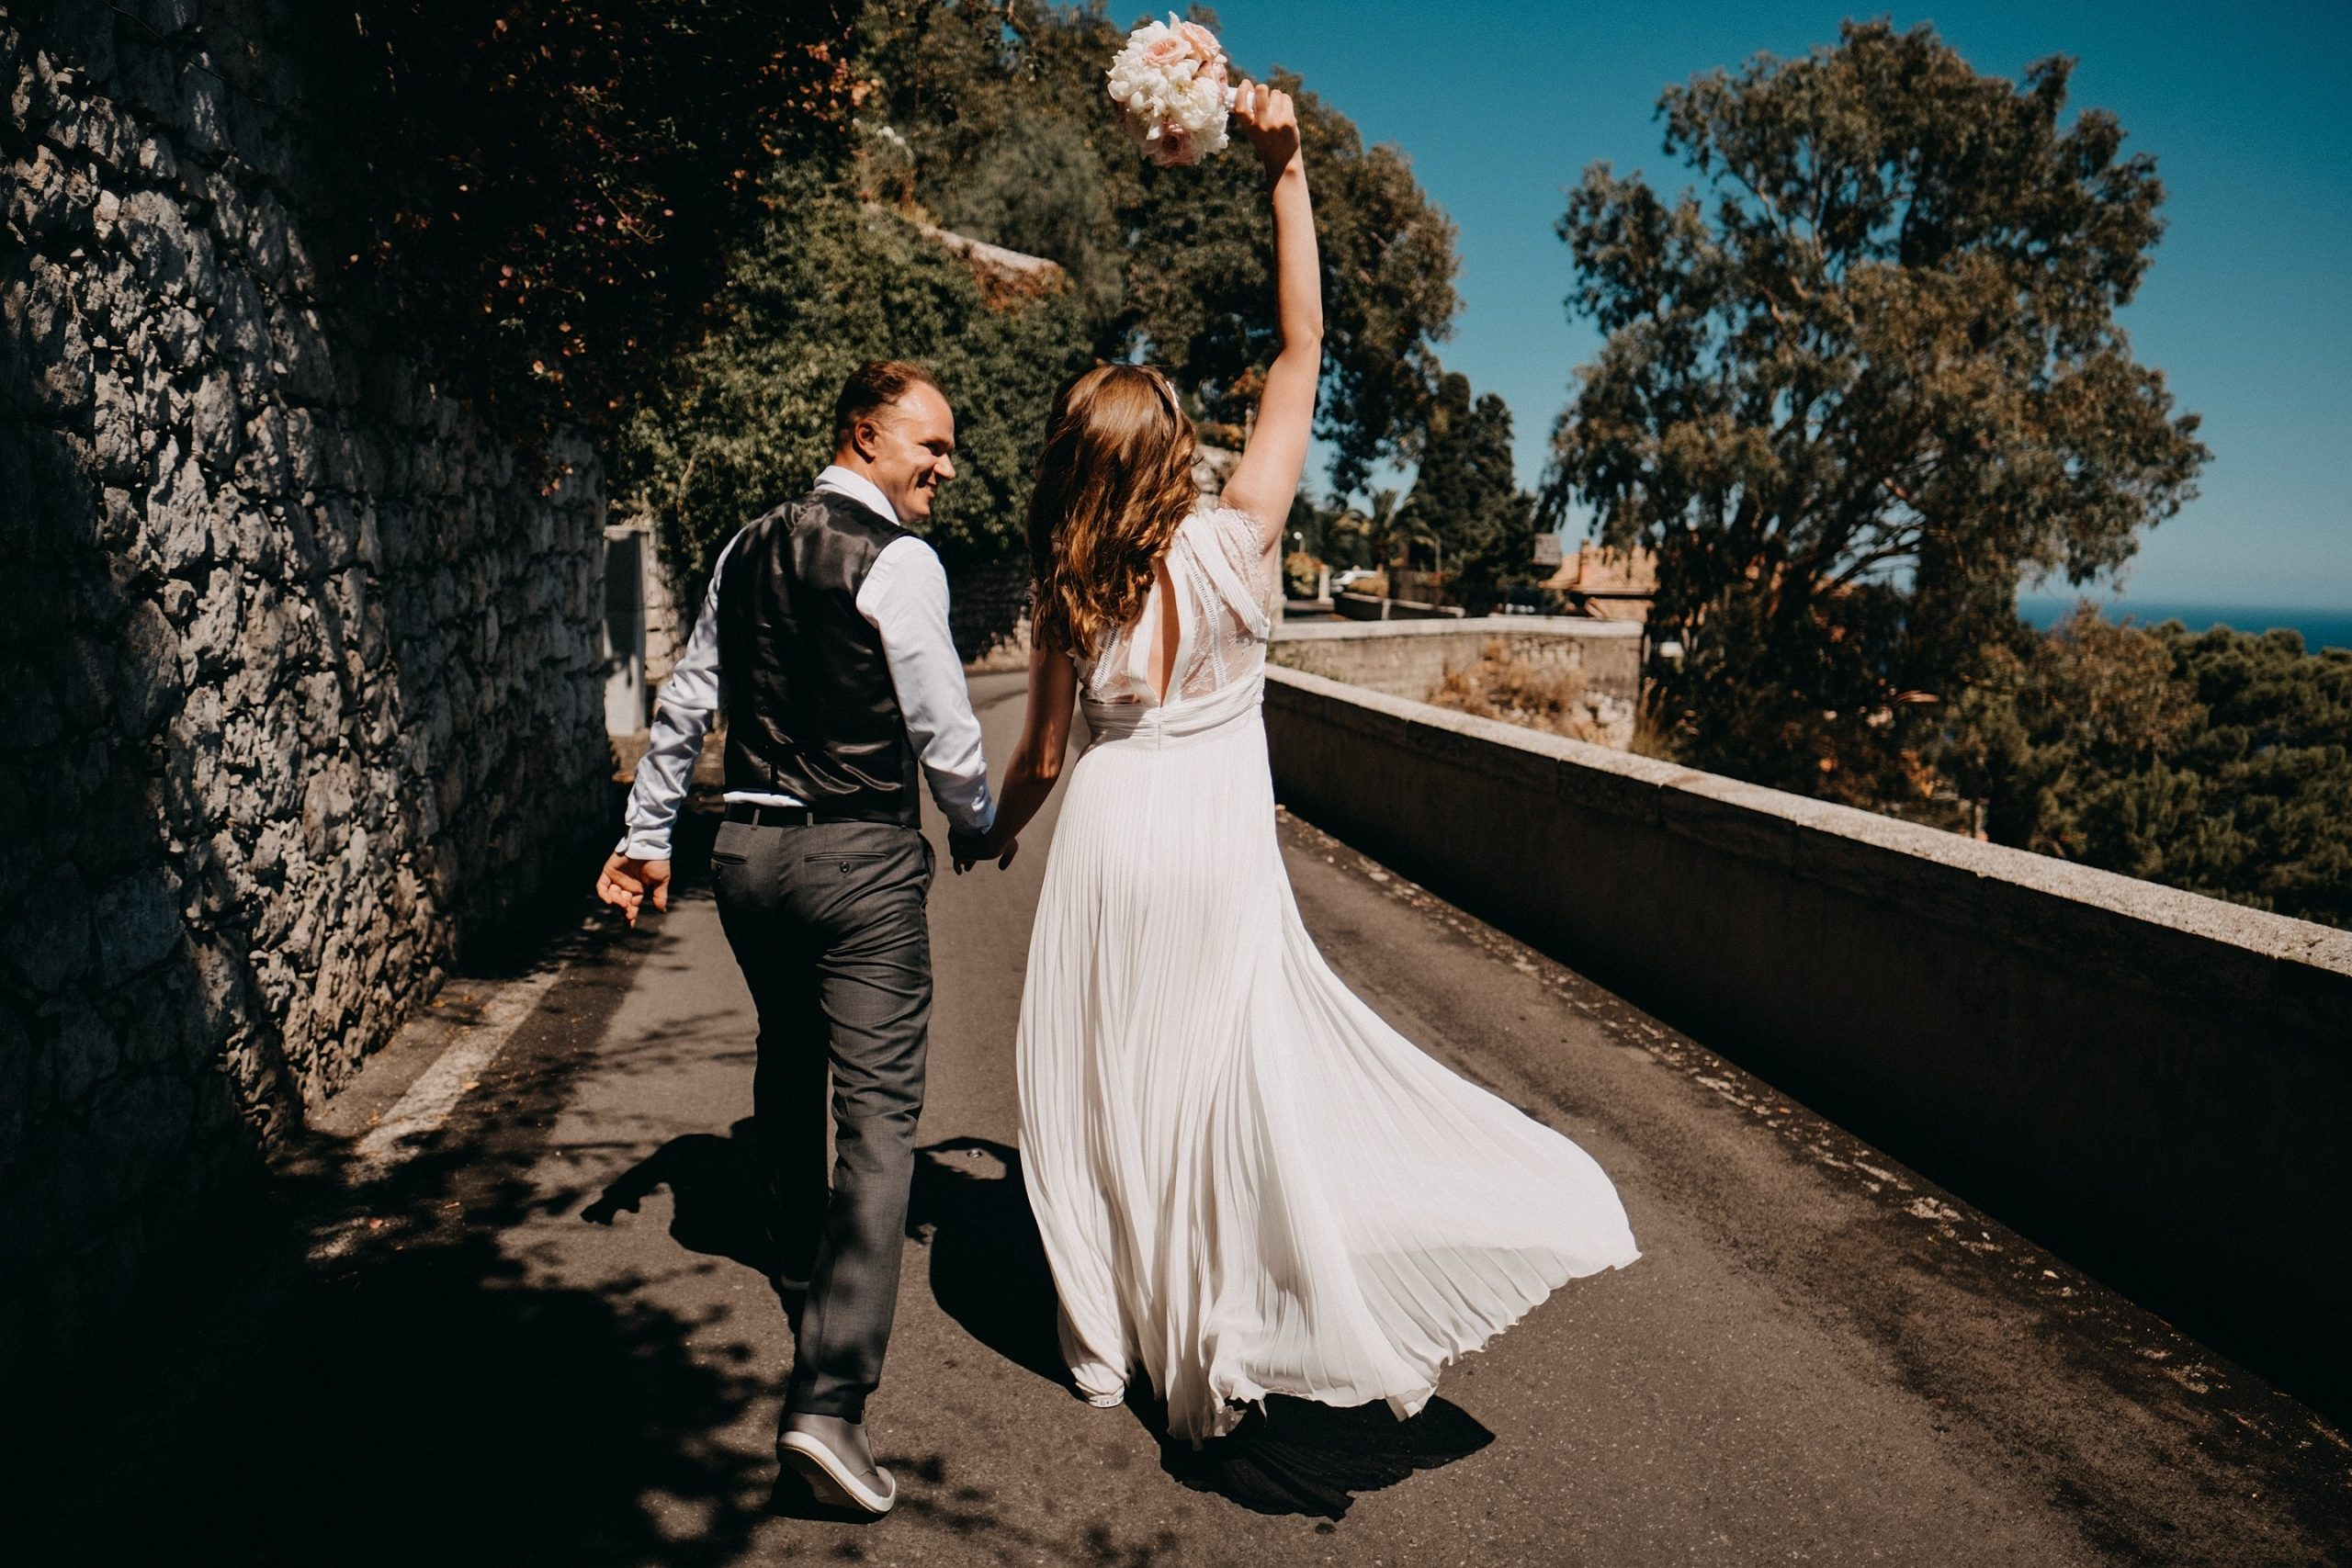 Italija Italy Sicilija vestuvės wedding destination dangus puokštė jaunieji groom bride best photos photographer professional ocean sea sunny saulėta